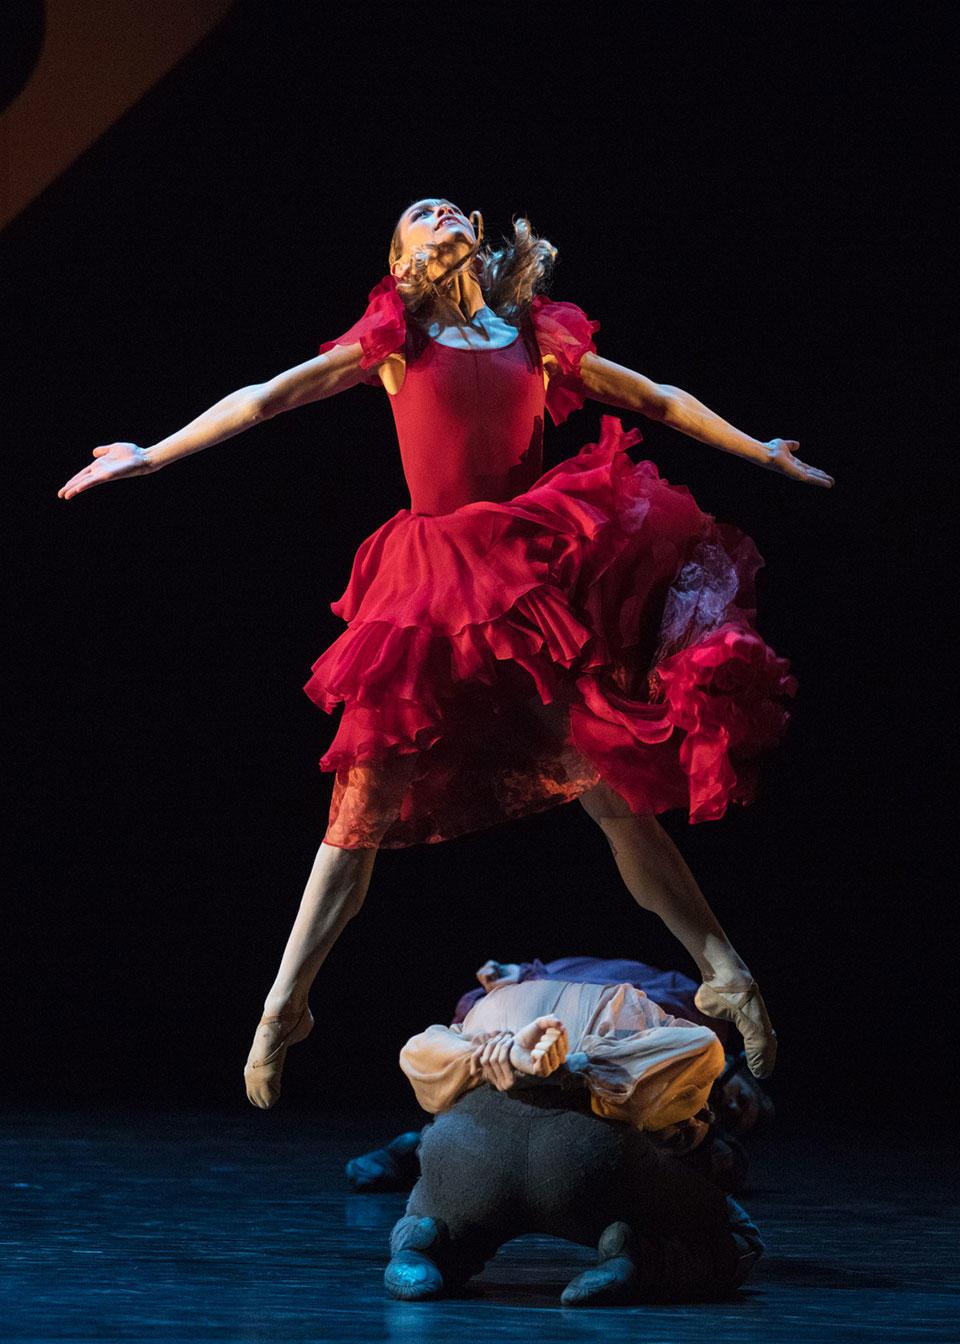 05_Ann_Ray_Opera_national_de_Paris-Carmen---Mats-Ek---Eleonora-Abbagnato--Ann-Ray-OnP-0129-1600p.jpg